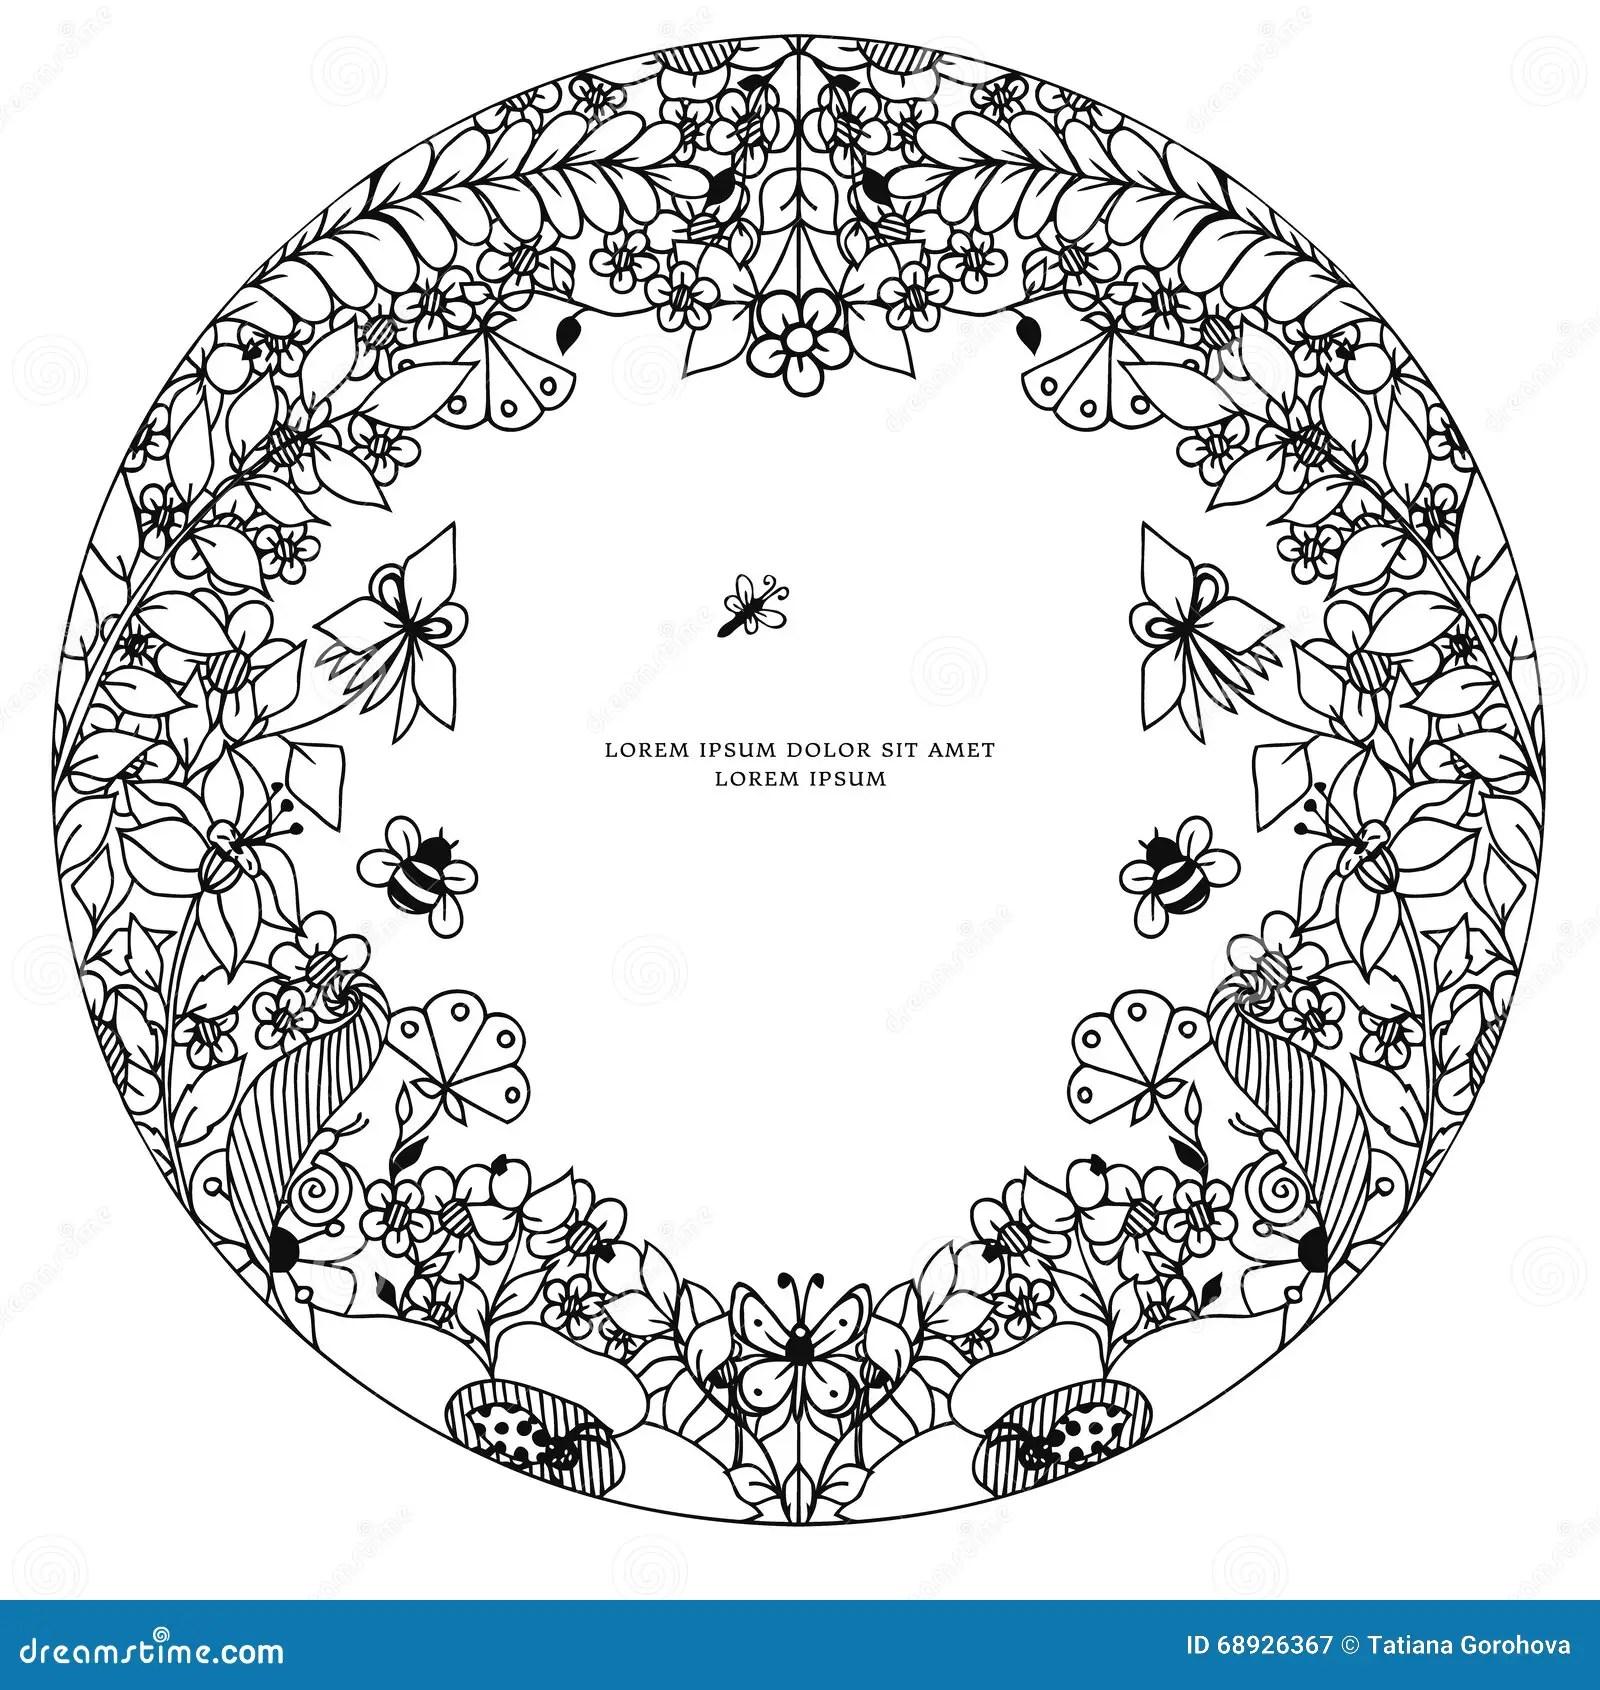 Bee Doodle Vector Illustration